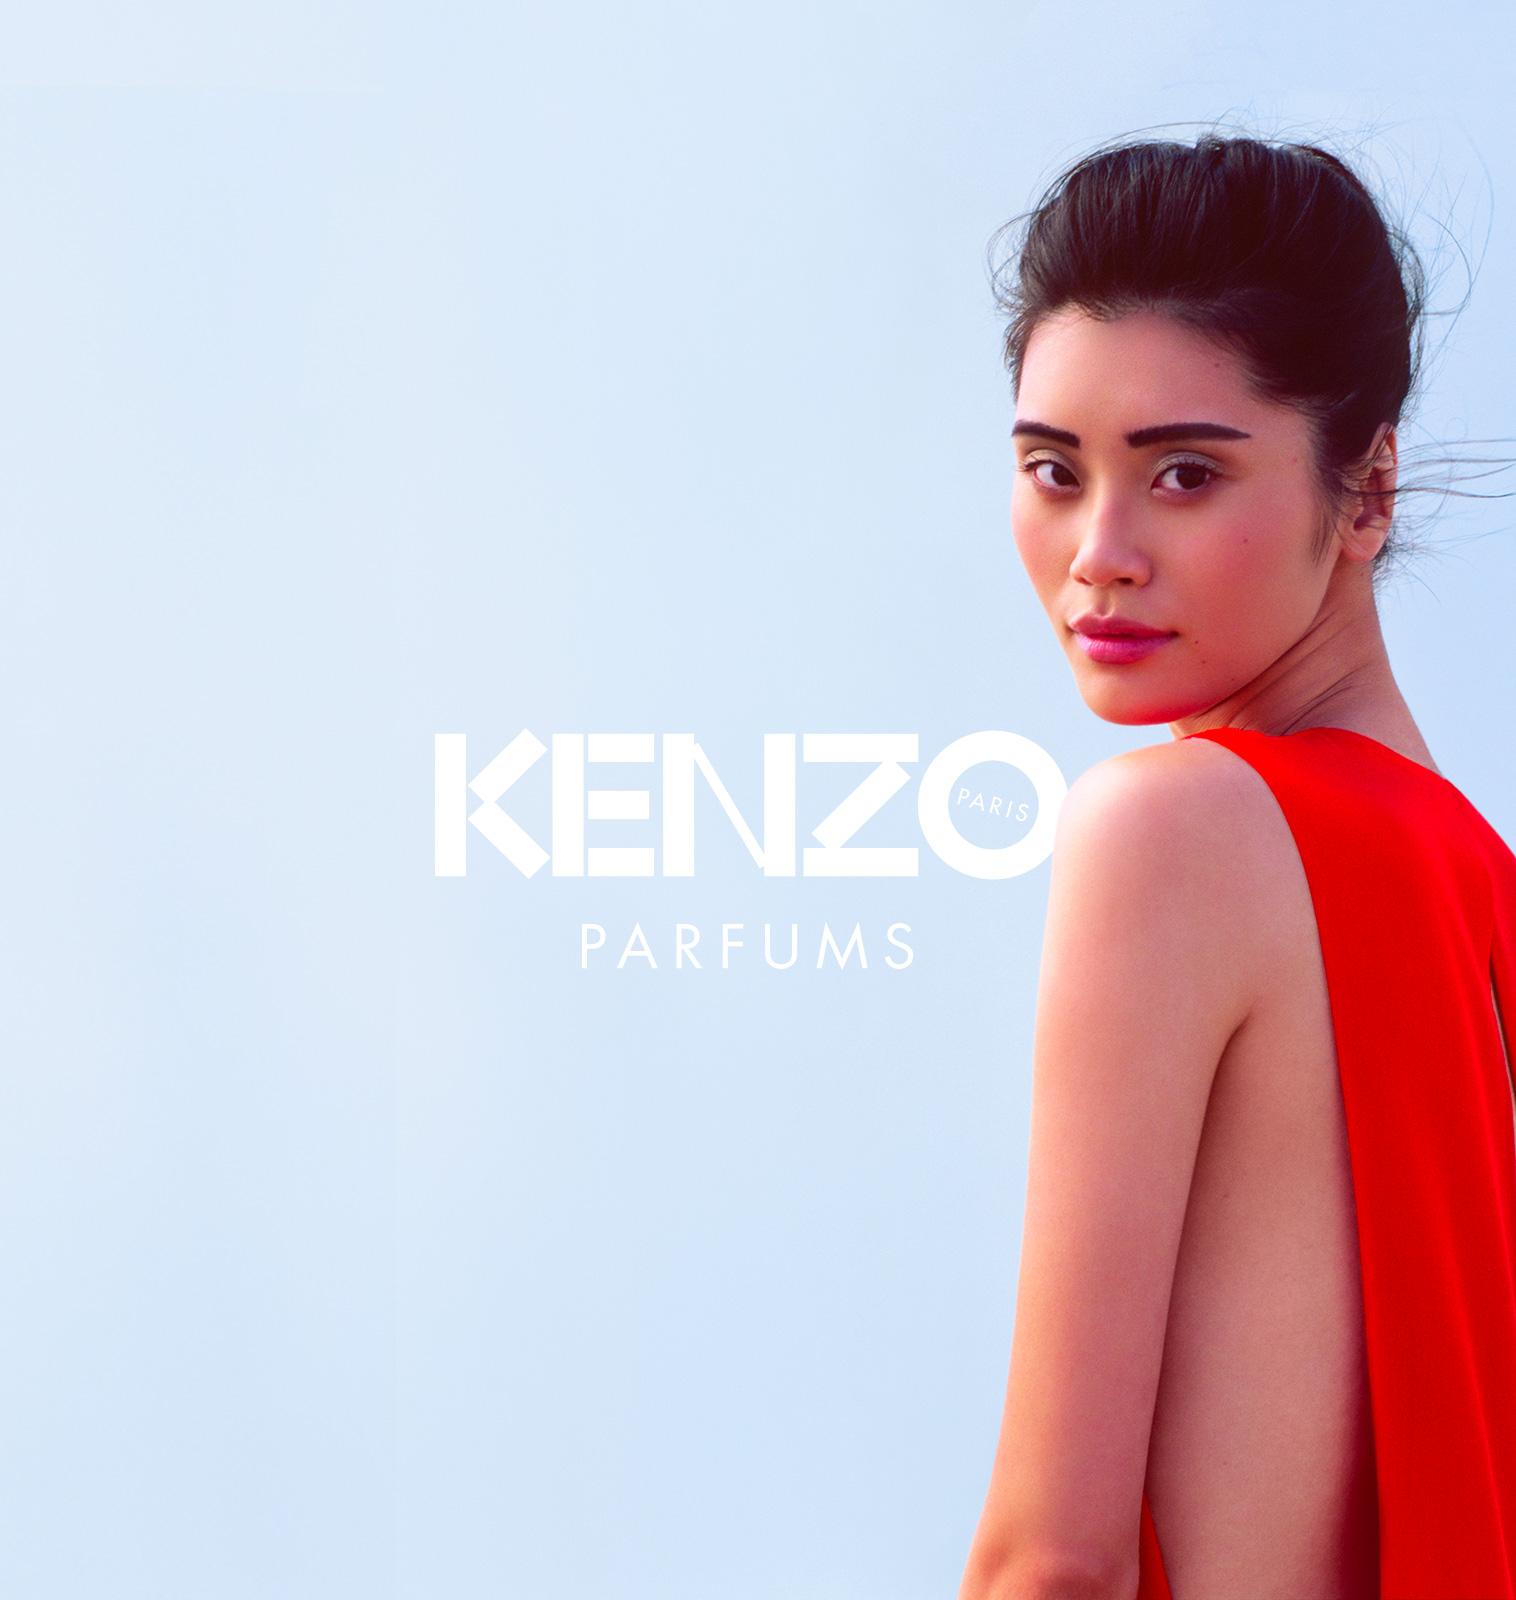 Kenzo™ Parfums